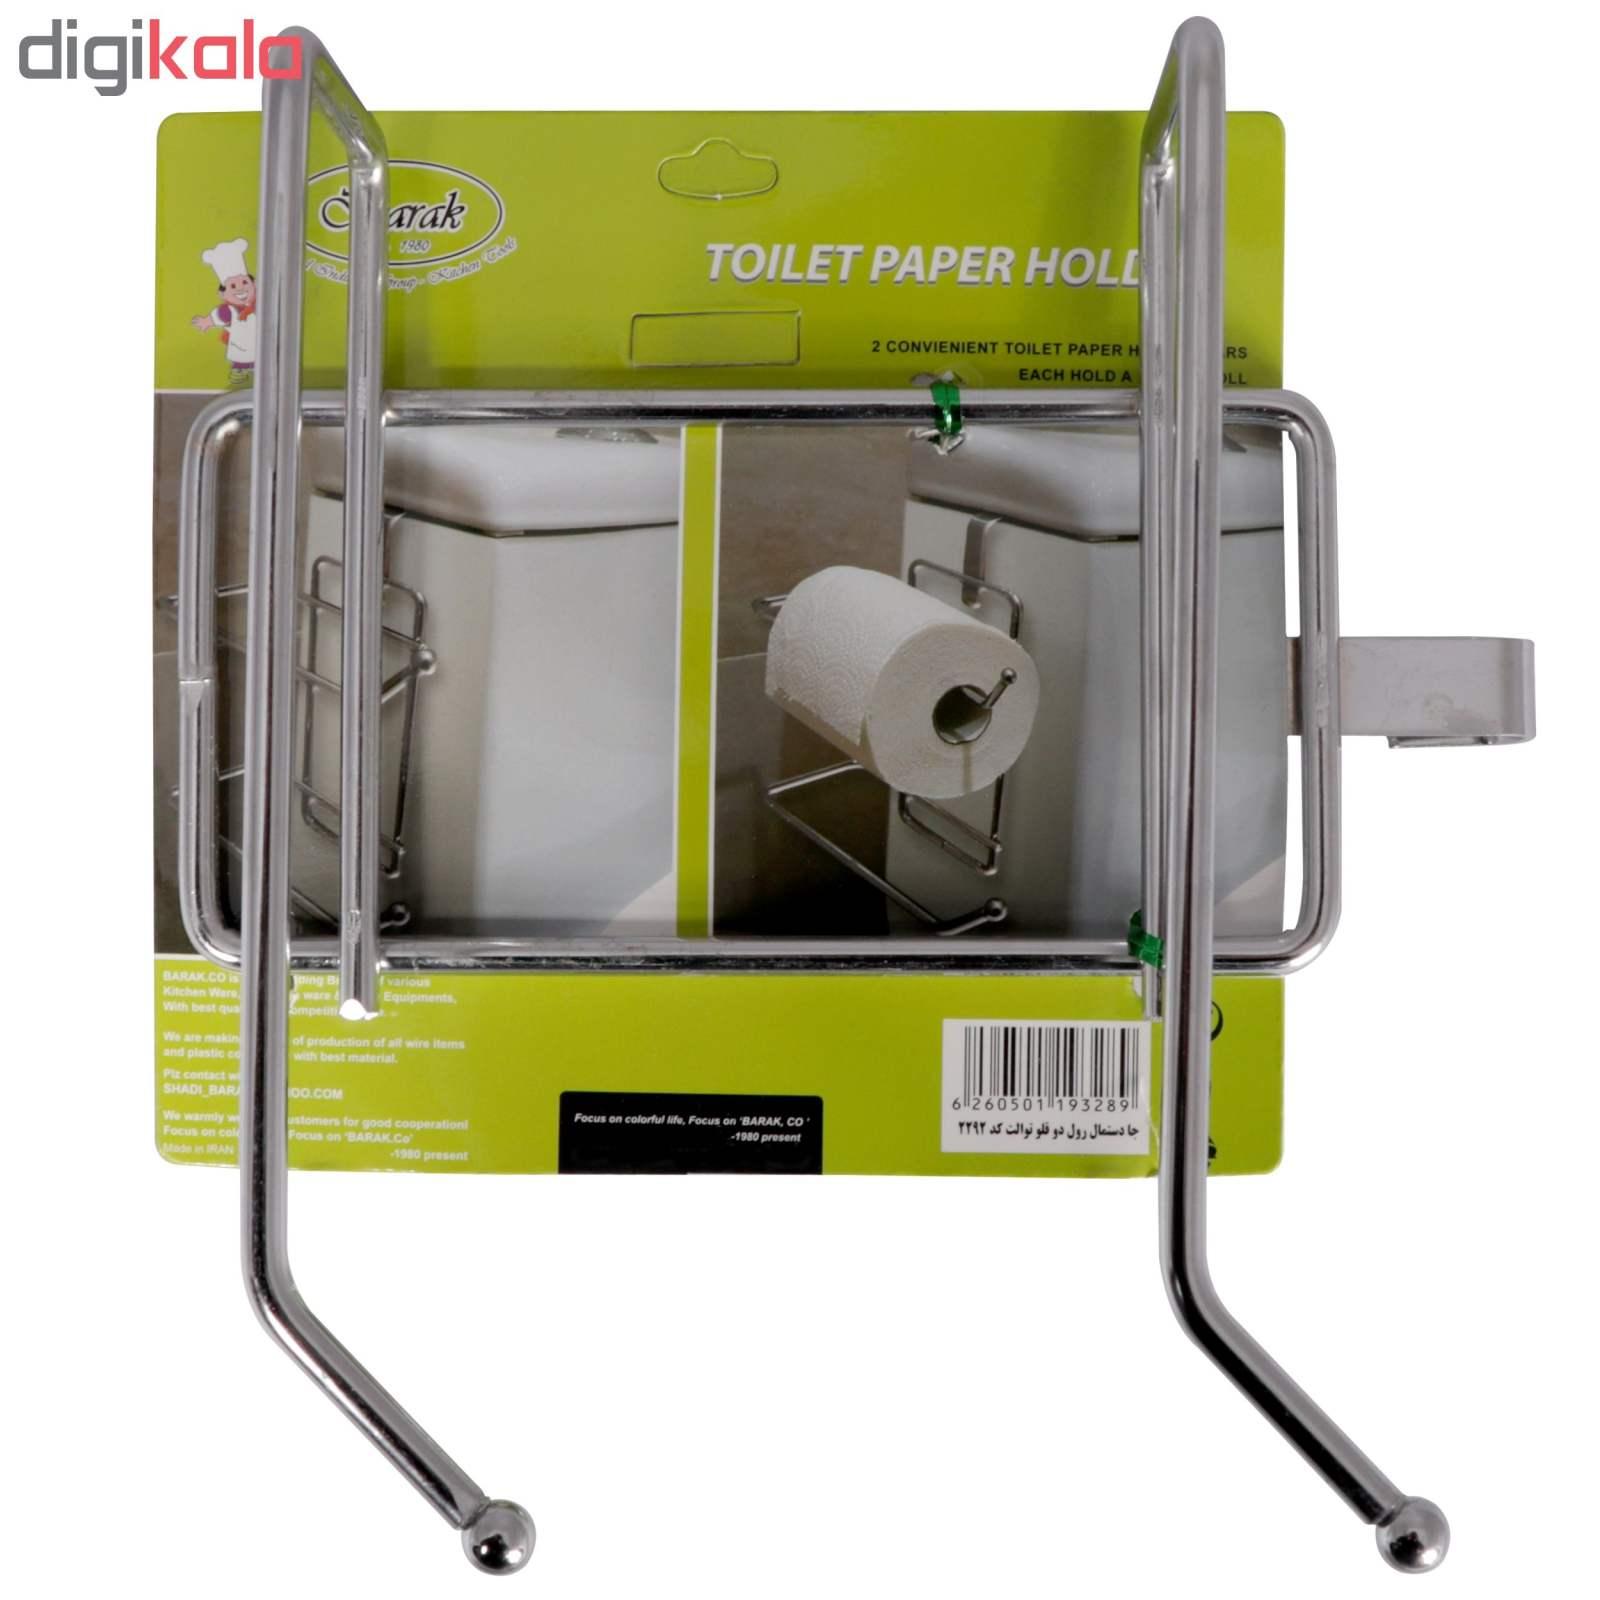 پایه رول دستمال کاغذی بارک کد 15002 main 1 2